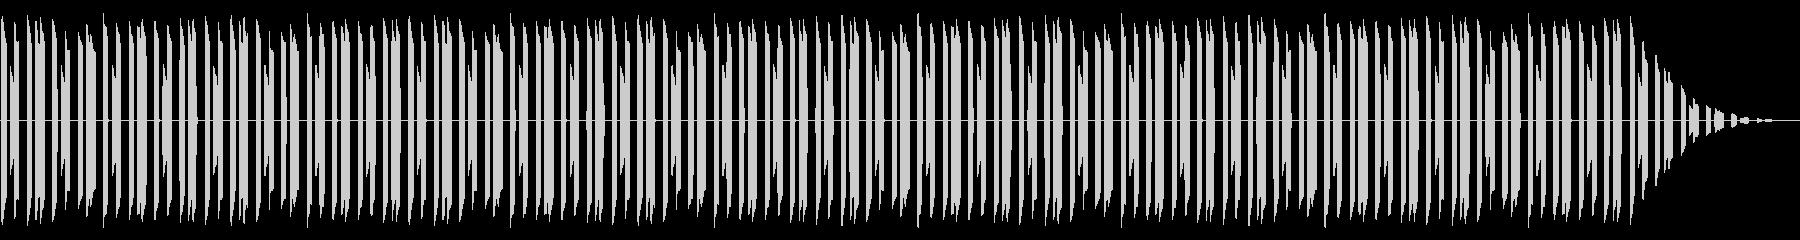 NES 汎用 A02-1(ステージ) の未再生の波形